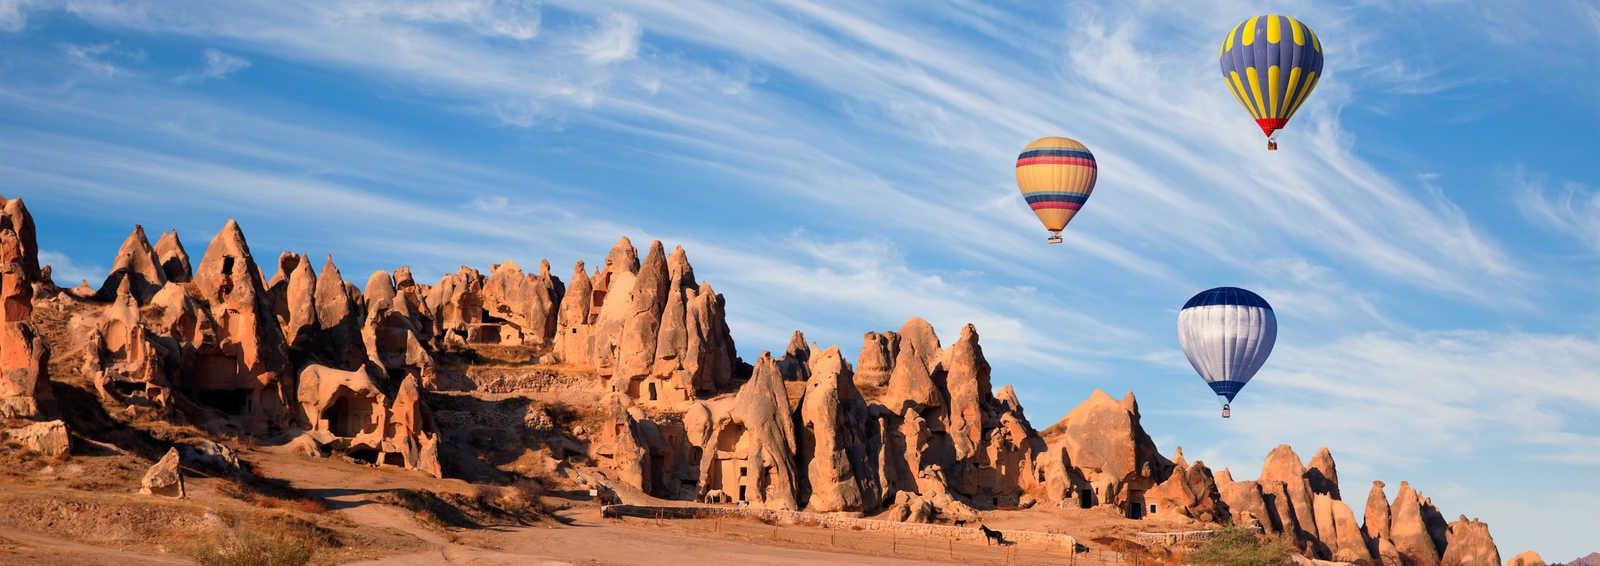 Hot air balloon flying over spectacular Cappadocia, Turkey